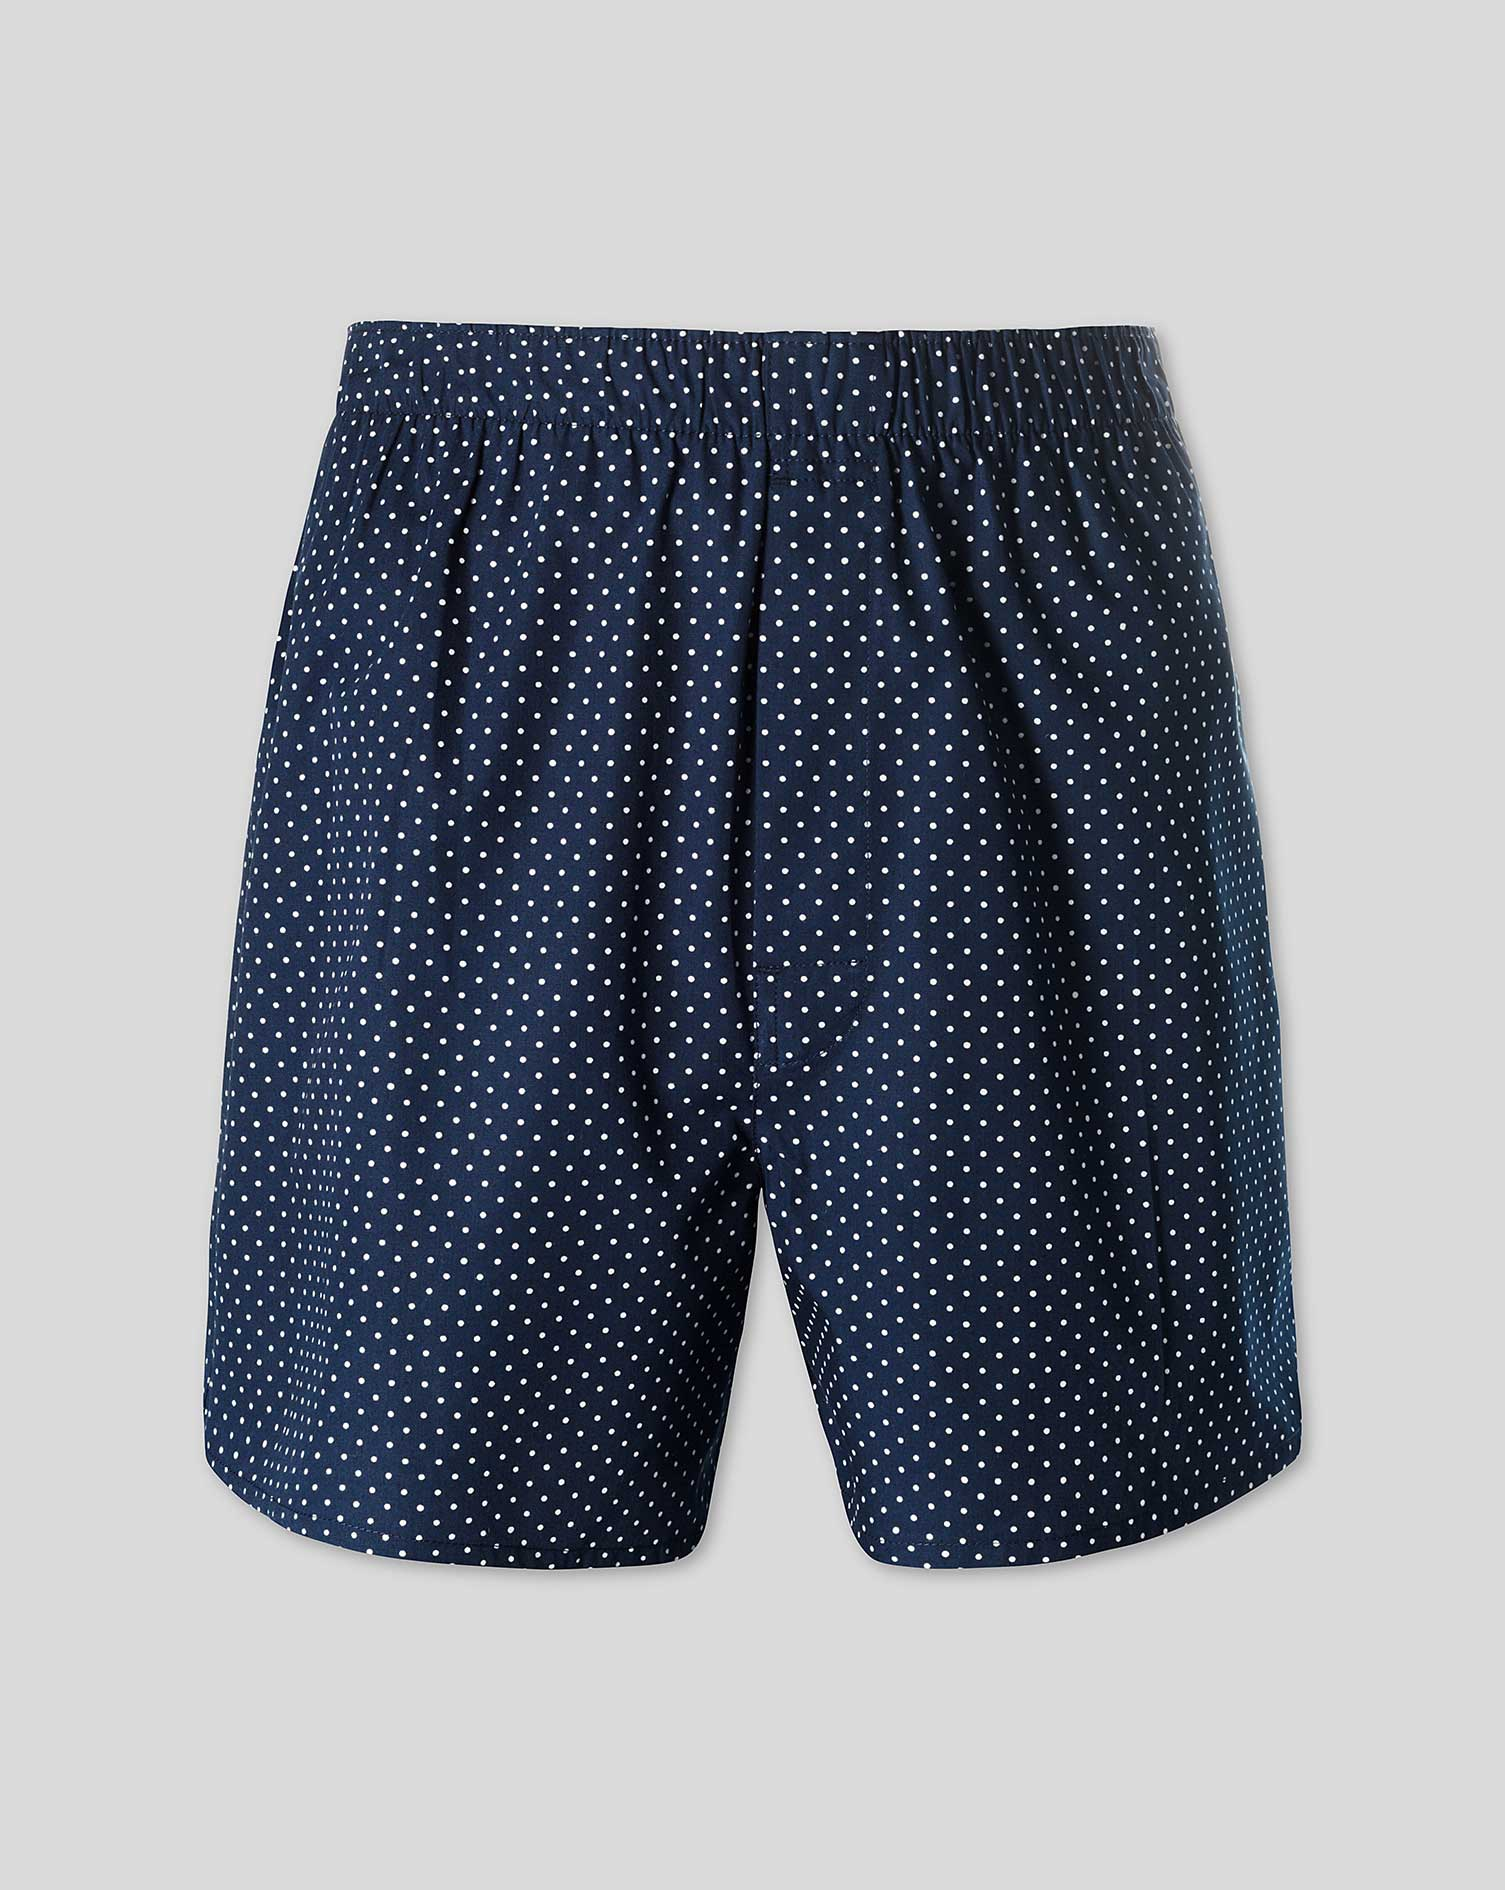 Cotton Navy Printed Dot Woven Boxers